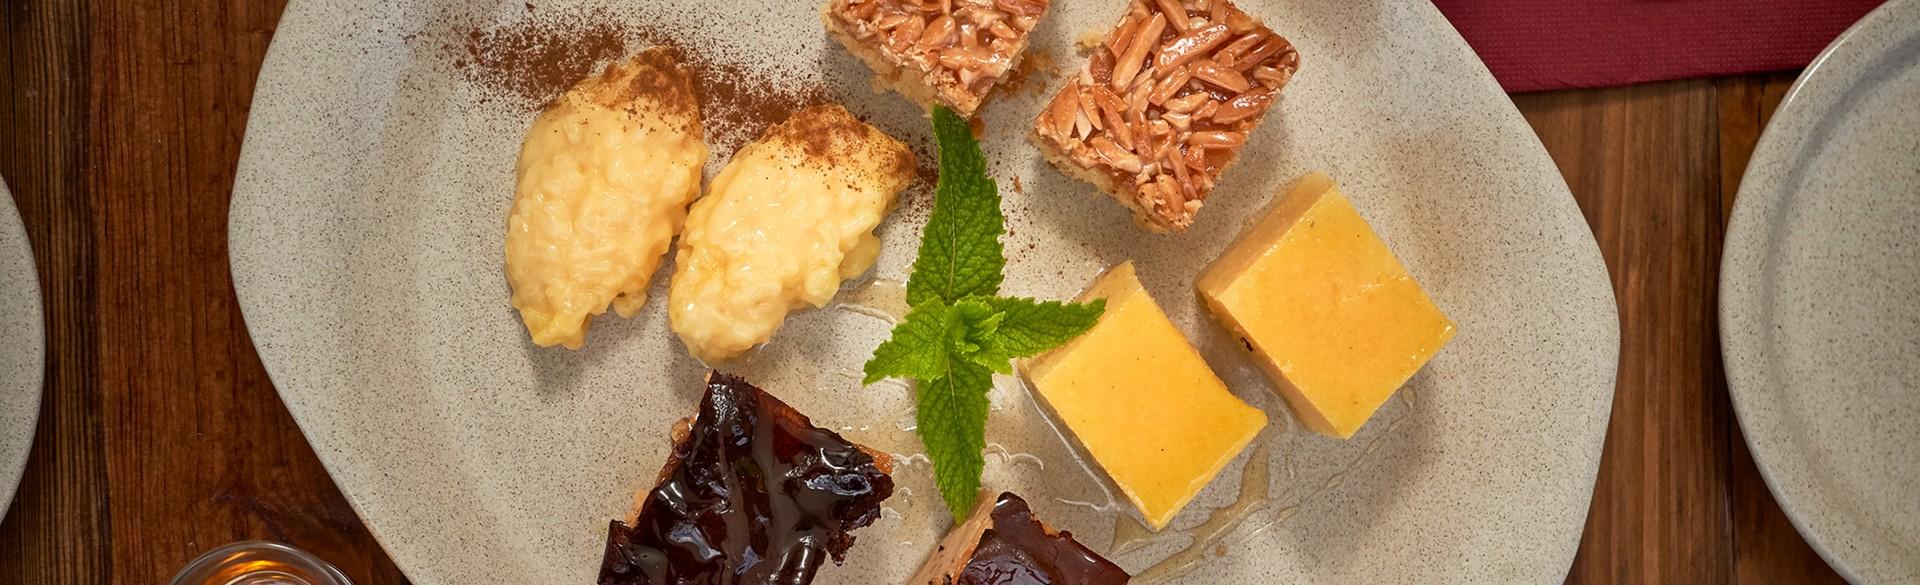 Pijama de sobremesas: tarte de amêndoa, papas de carolo, arroz doce, tijelada